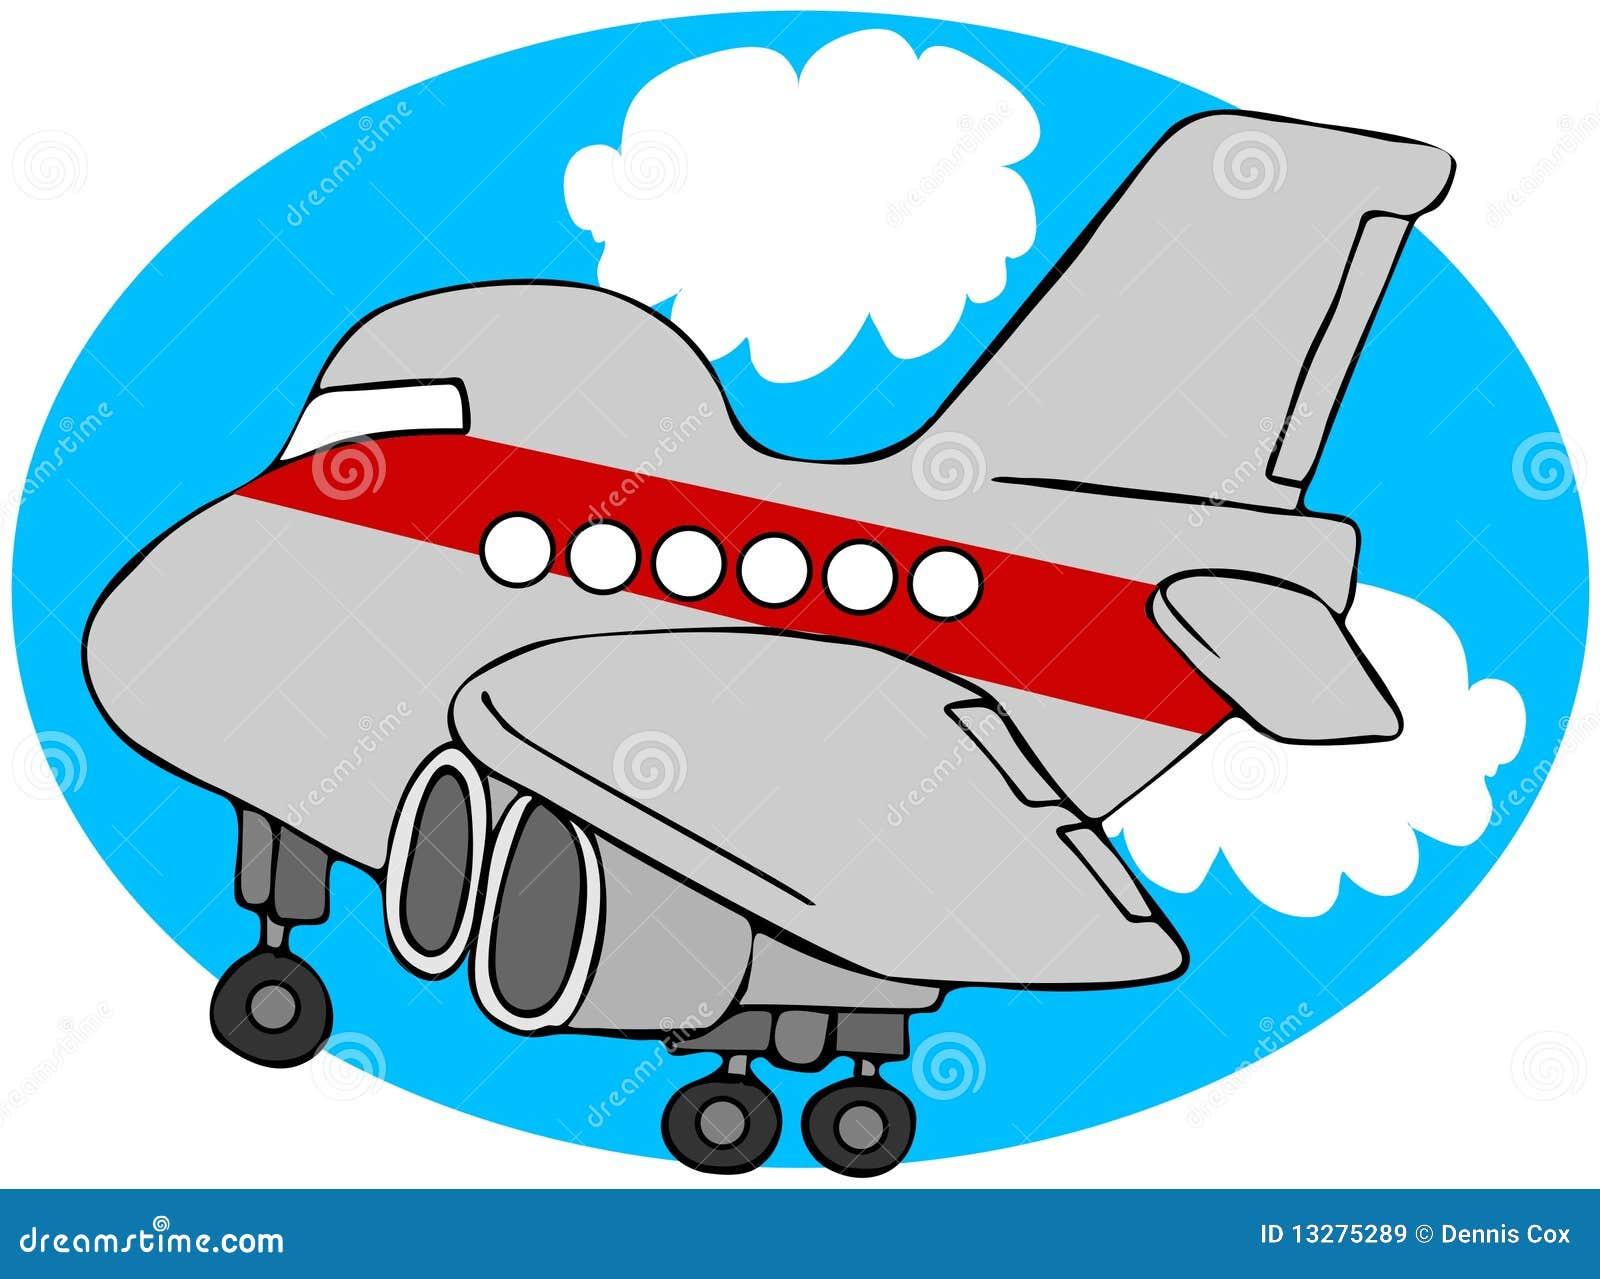 Avion de ligne dessin animé illustration stock